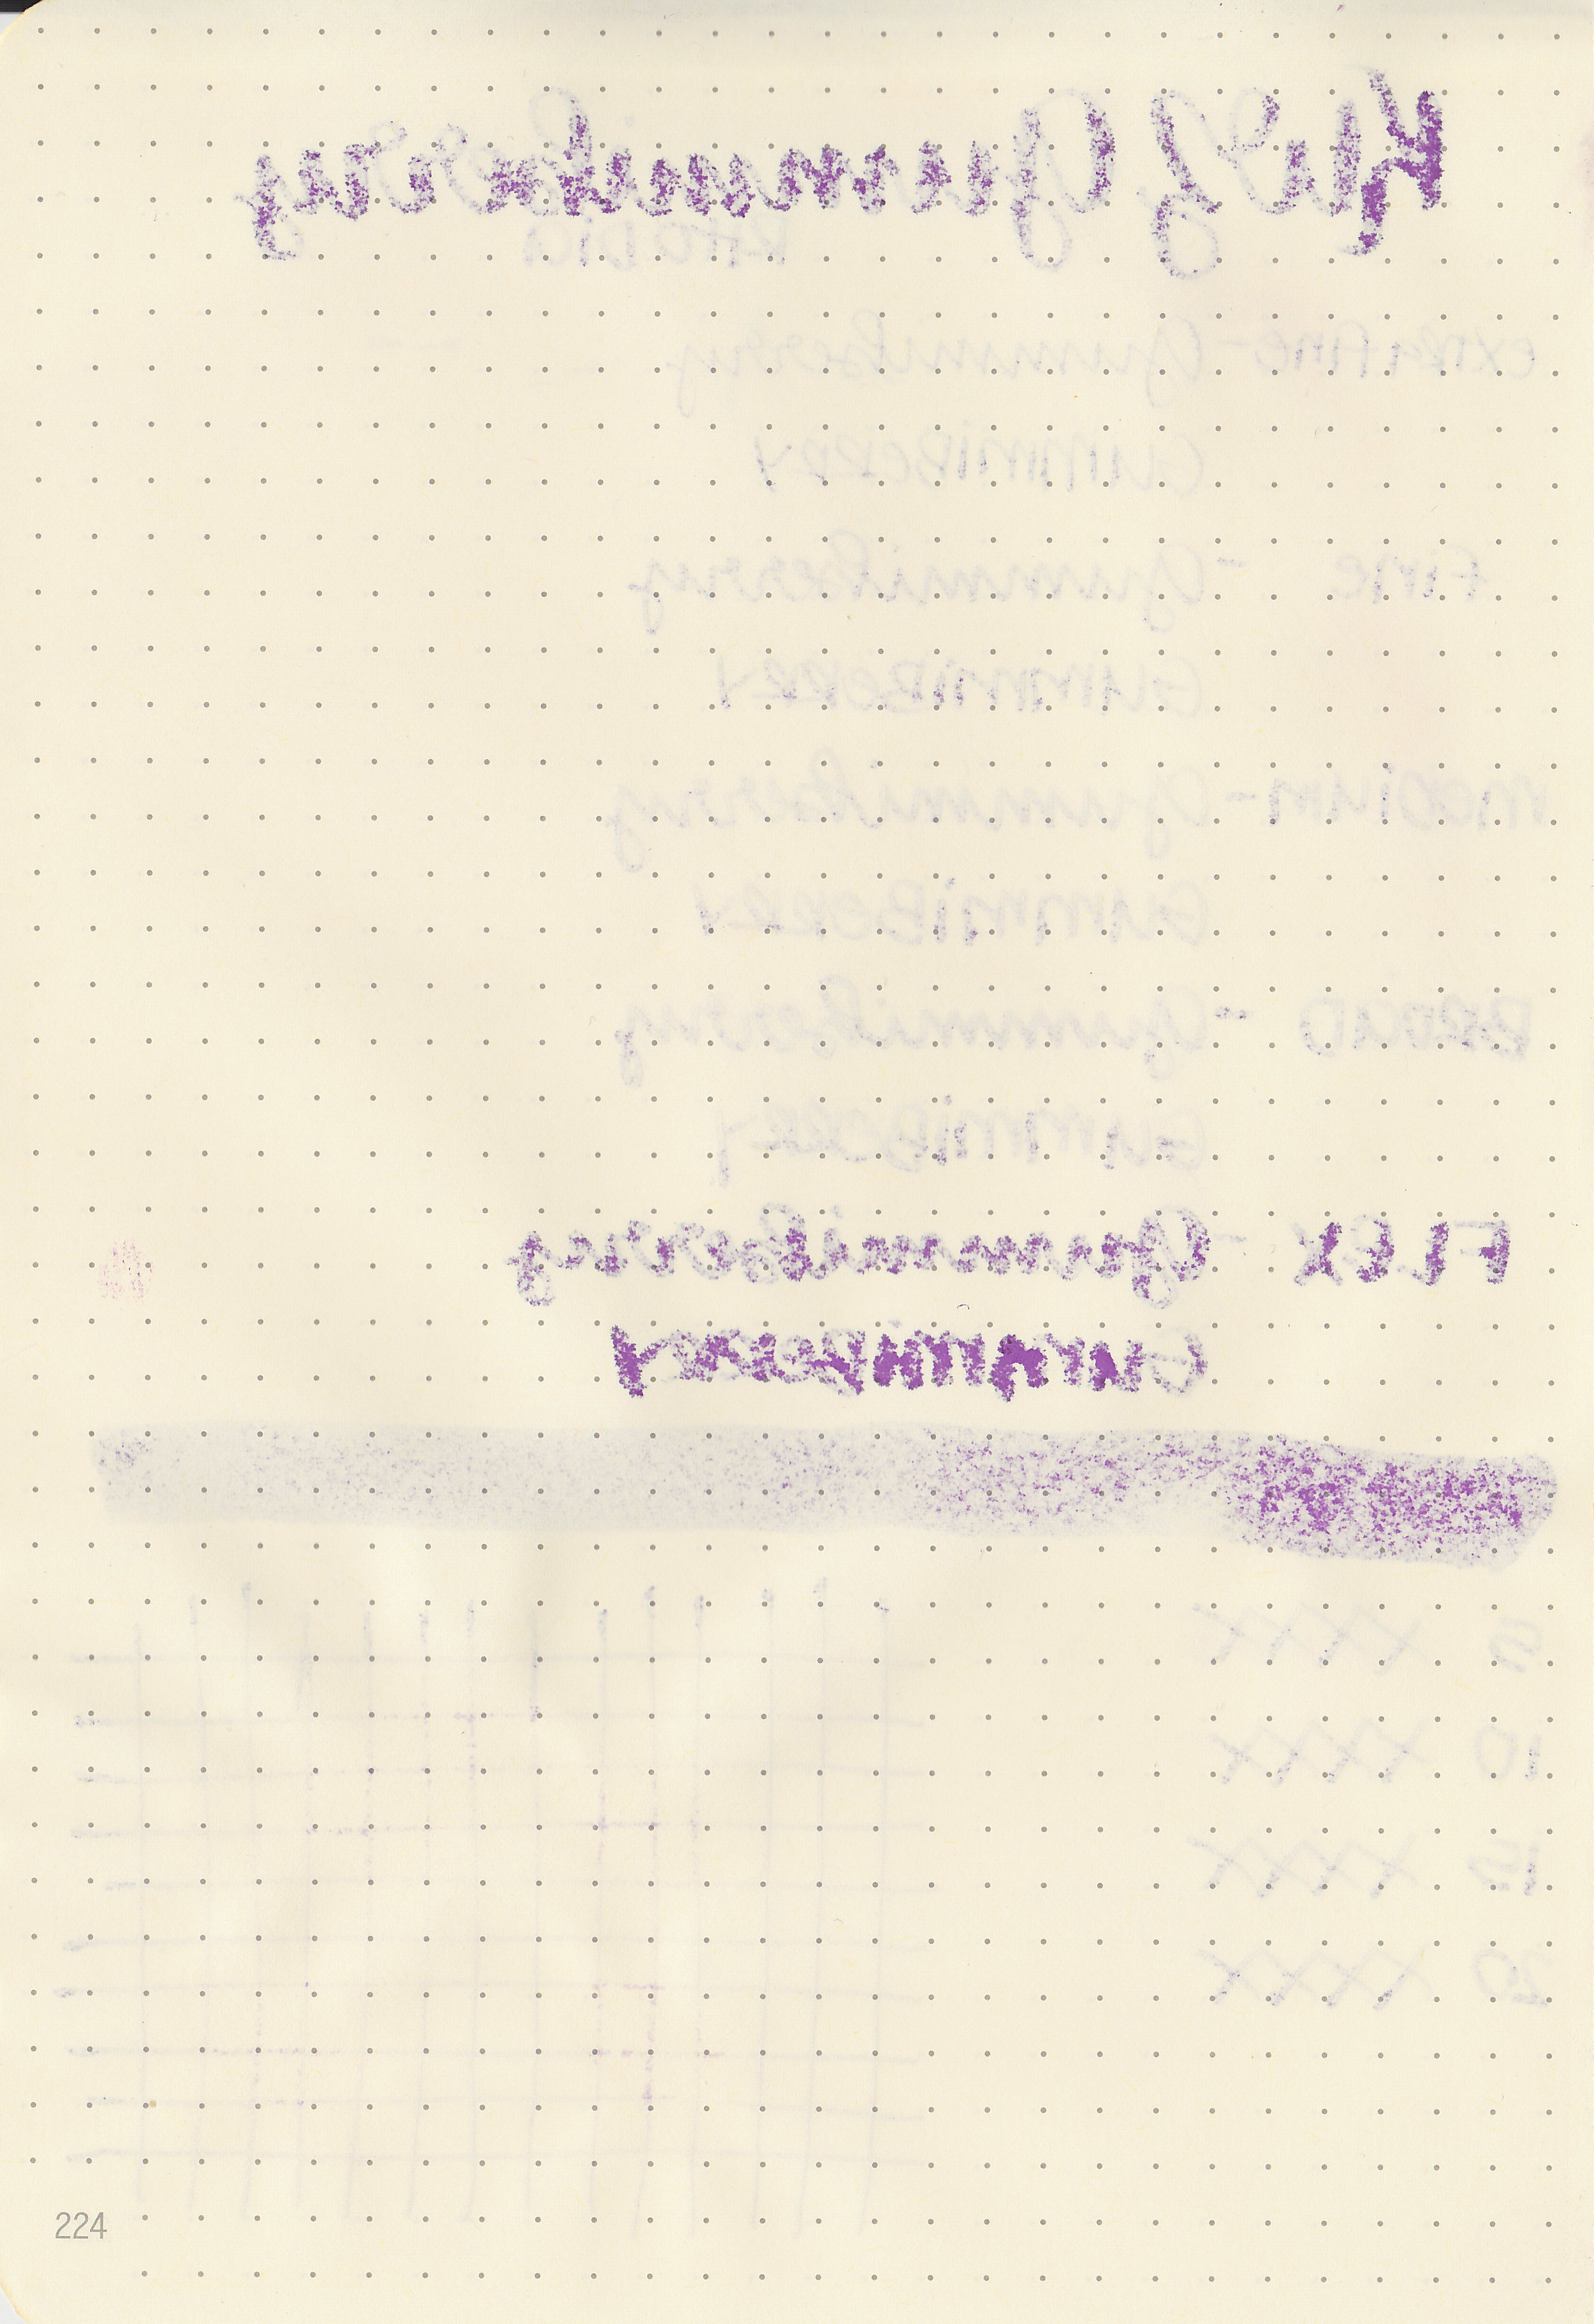 kwz-gummiberry-4.jpg